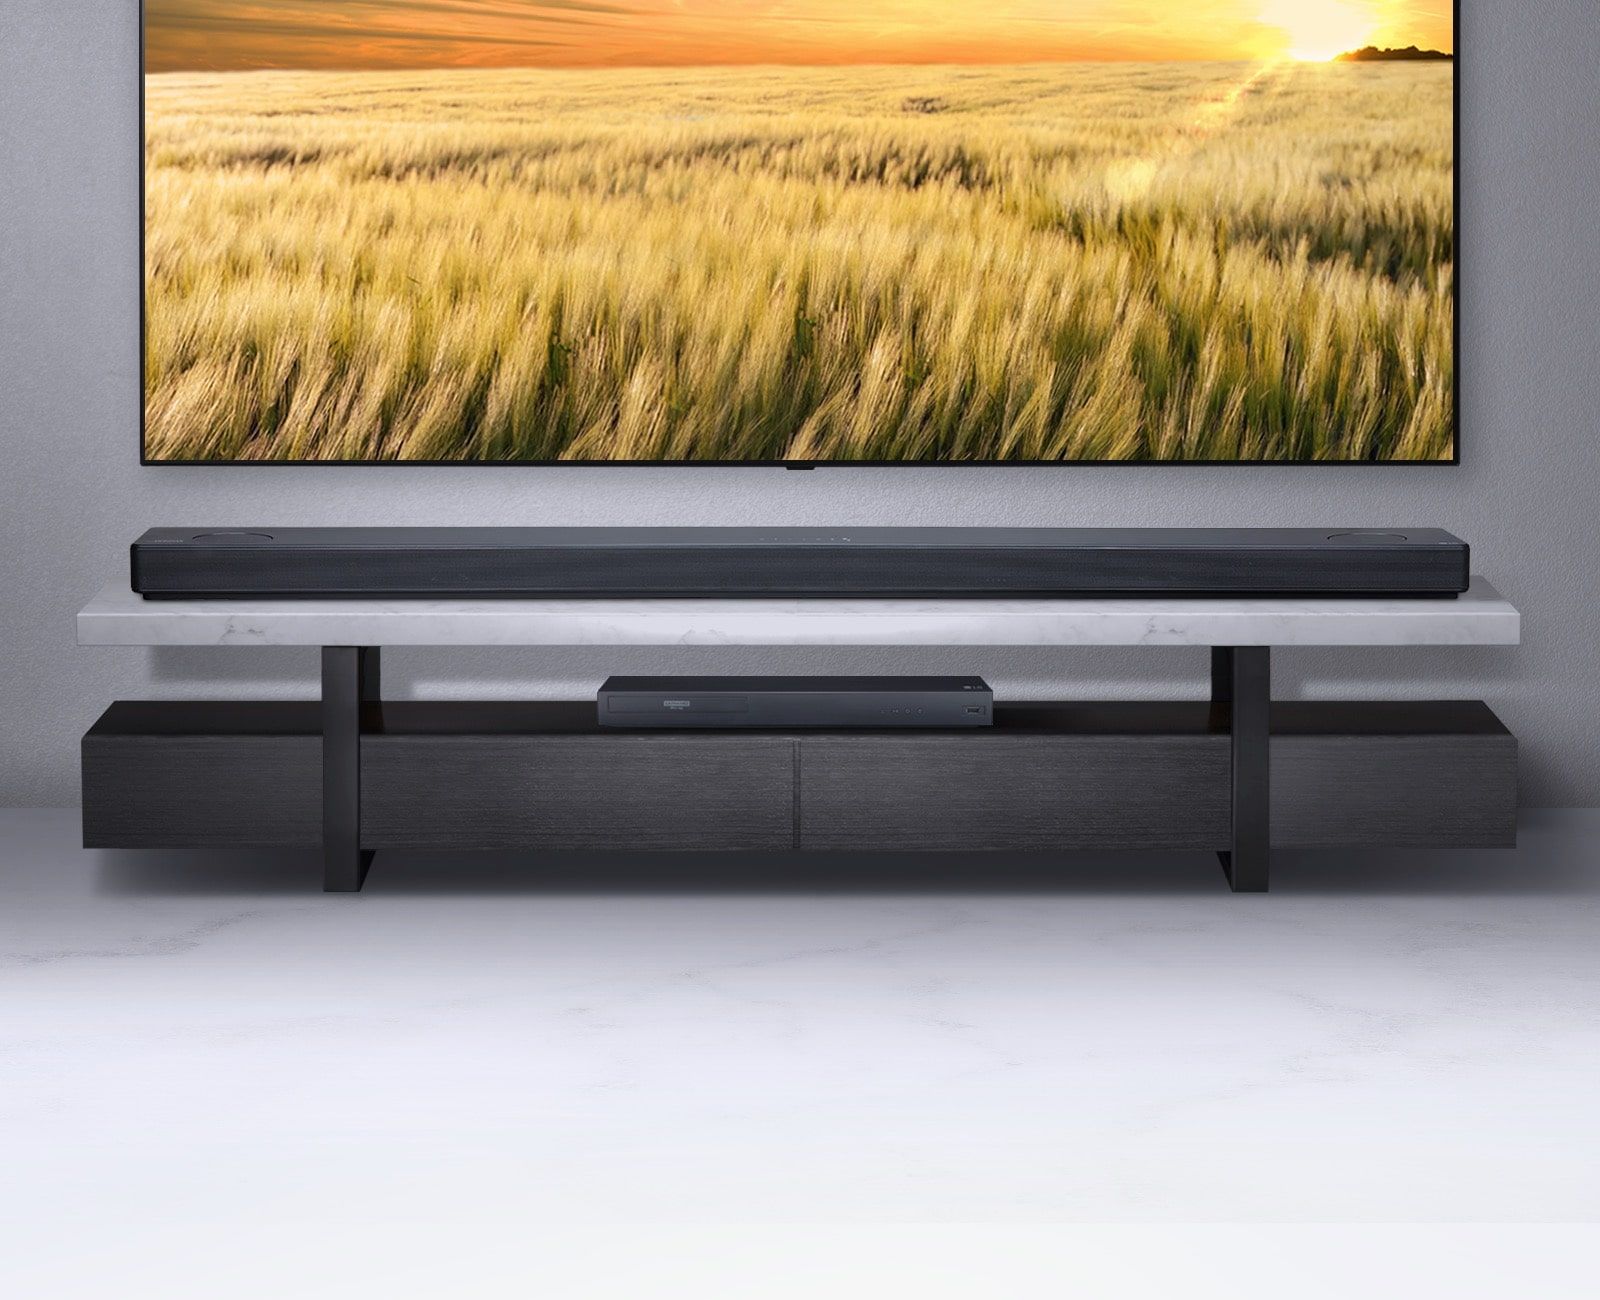 CAV-SoundBar-SL10YG-4K-Video-with-High-Resolution-Audio-Desktop